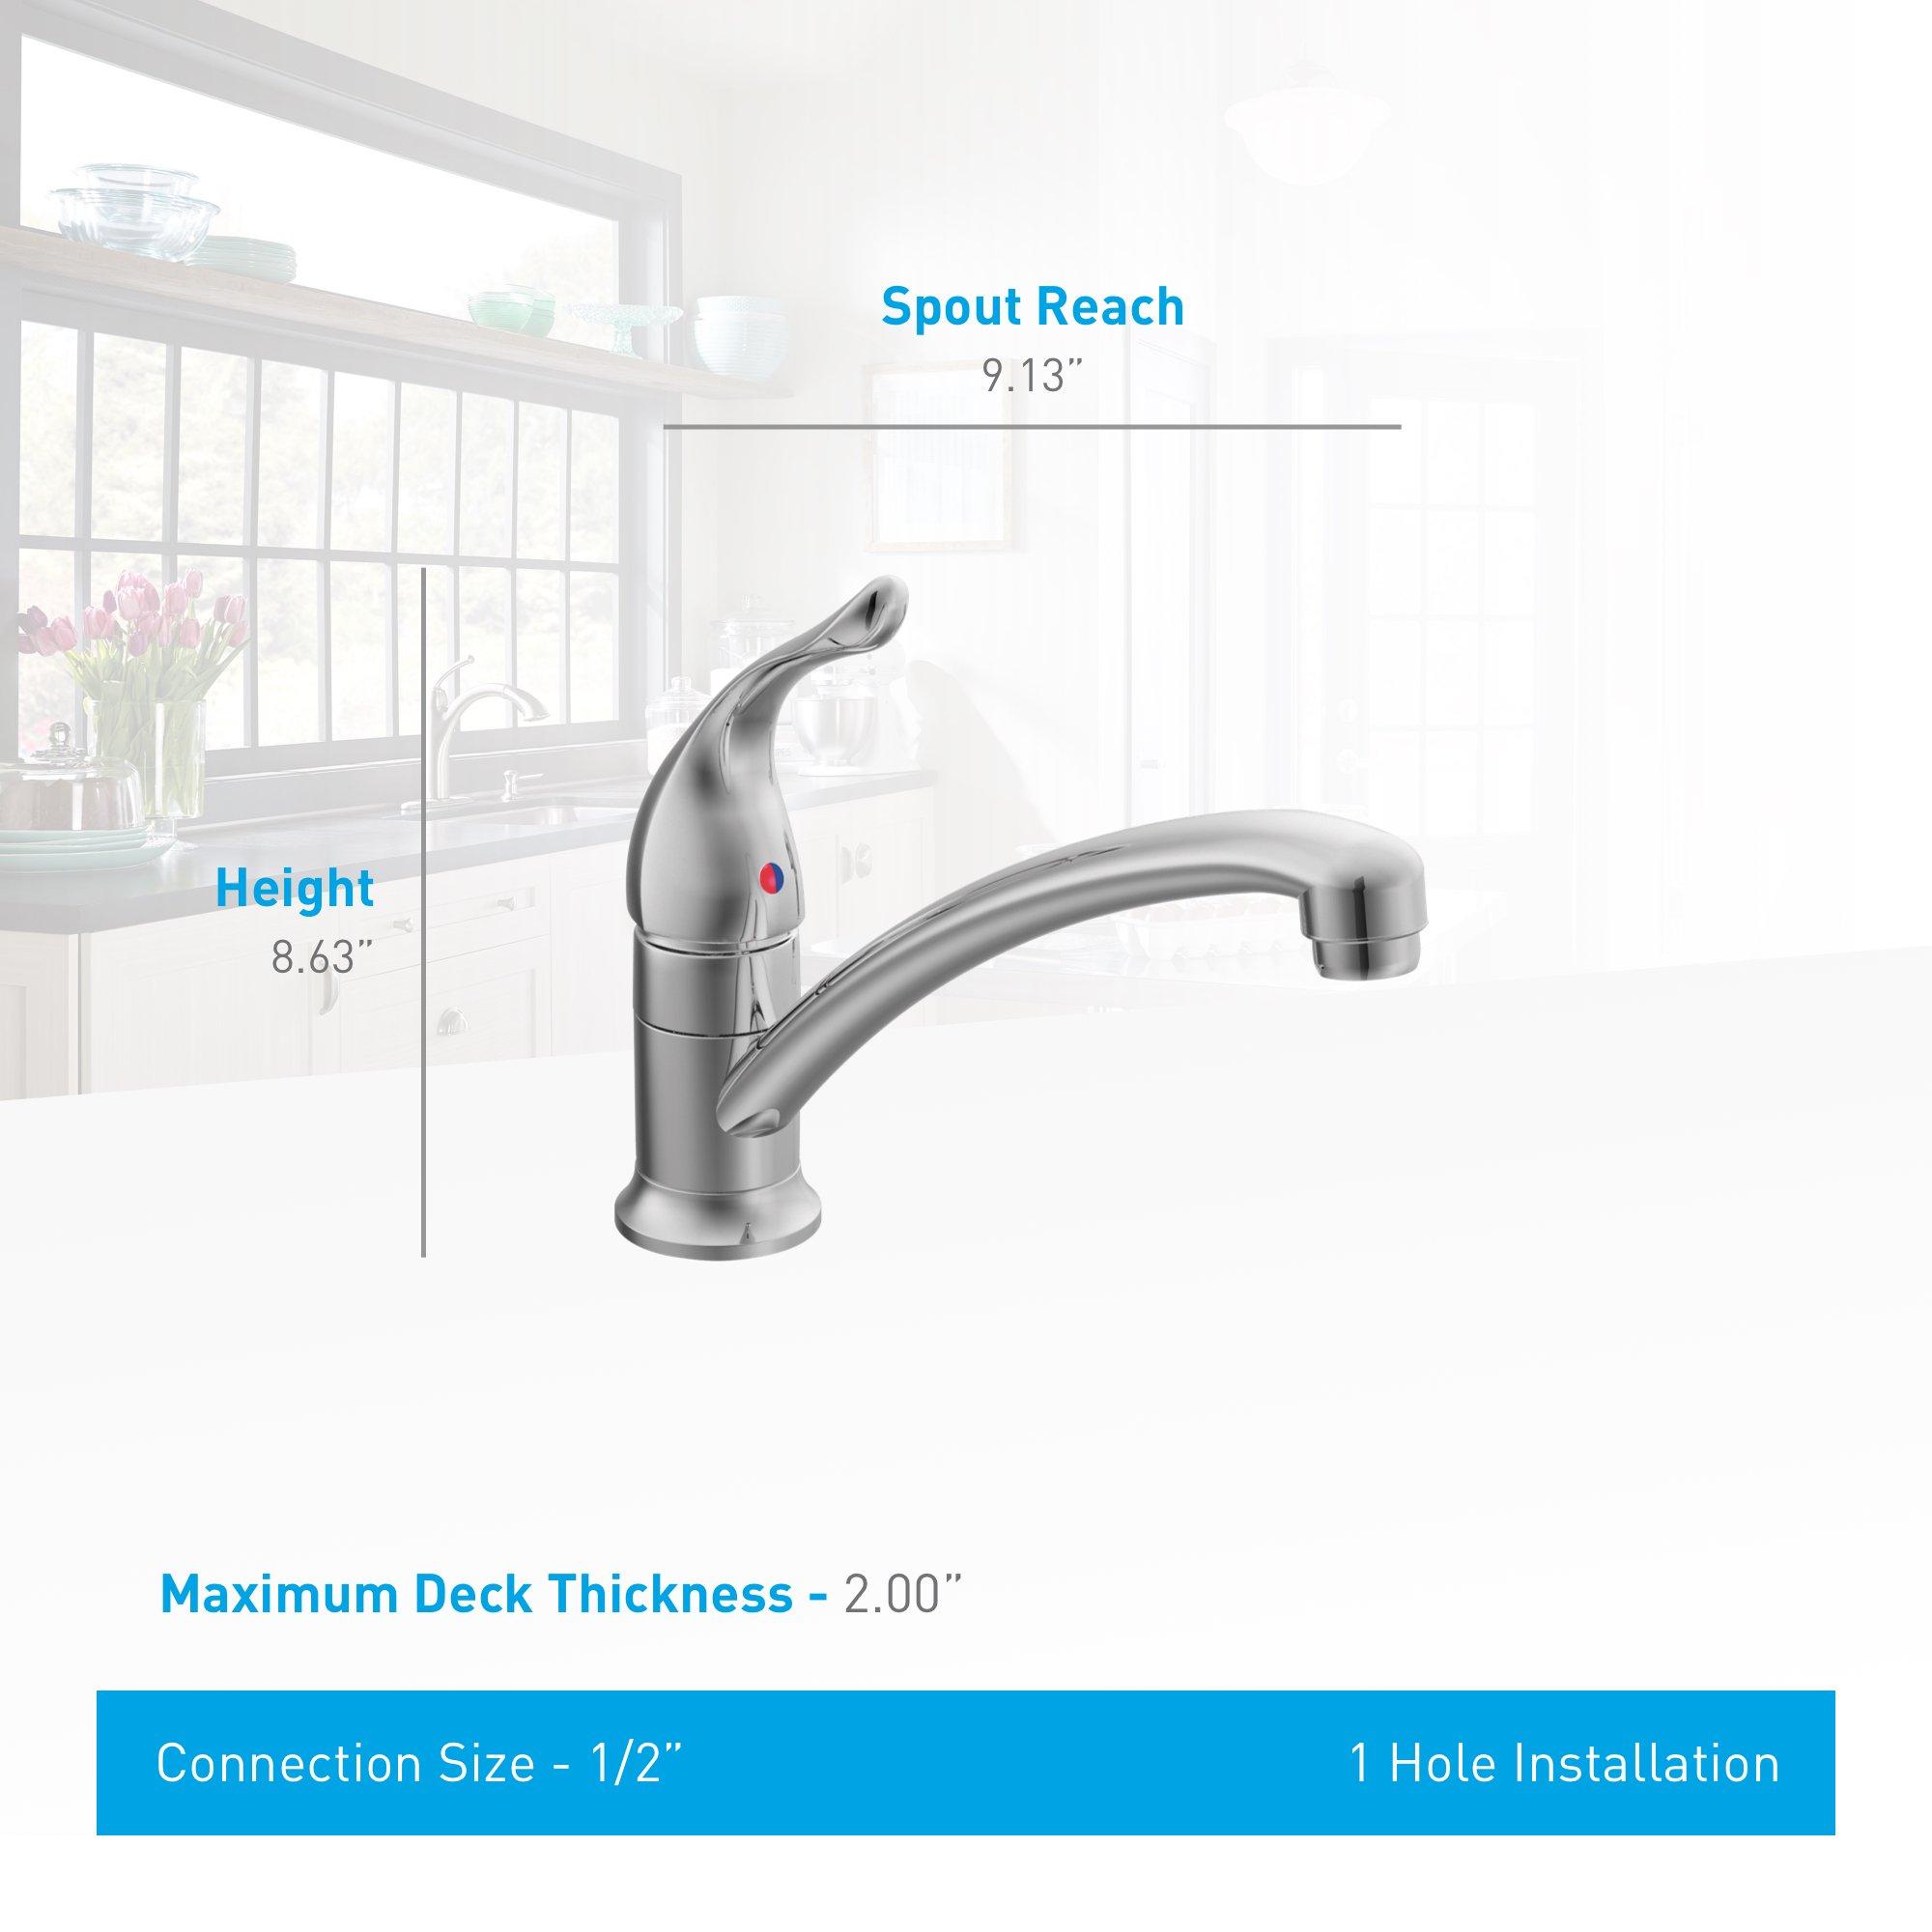 Moen 7423 Chateau One-Handle Low Arc Kitchen Faucet, Chrome by Moen